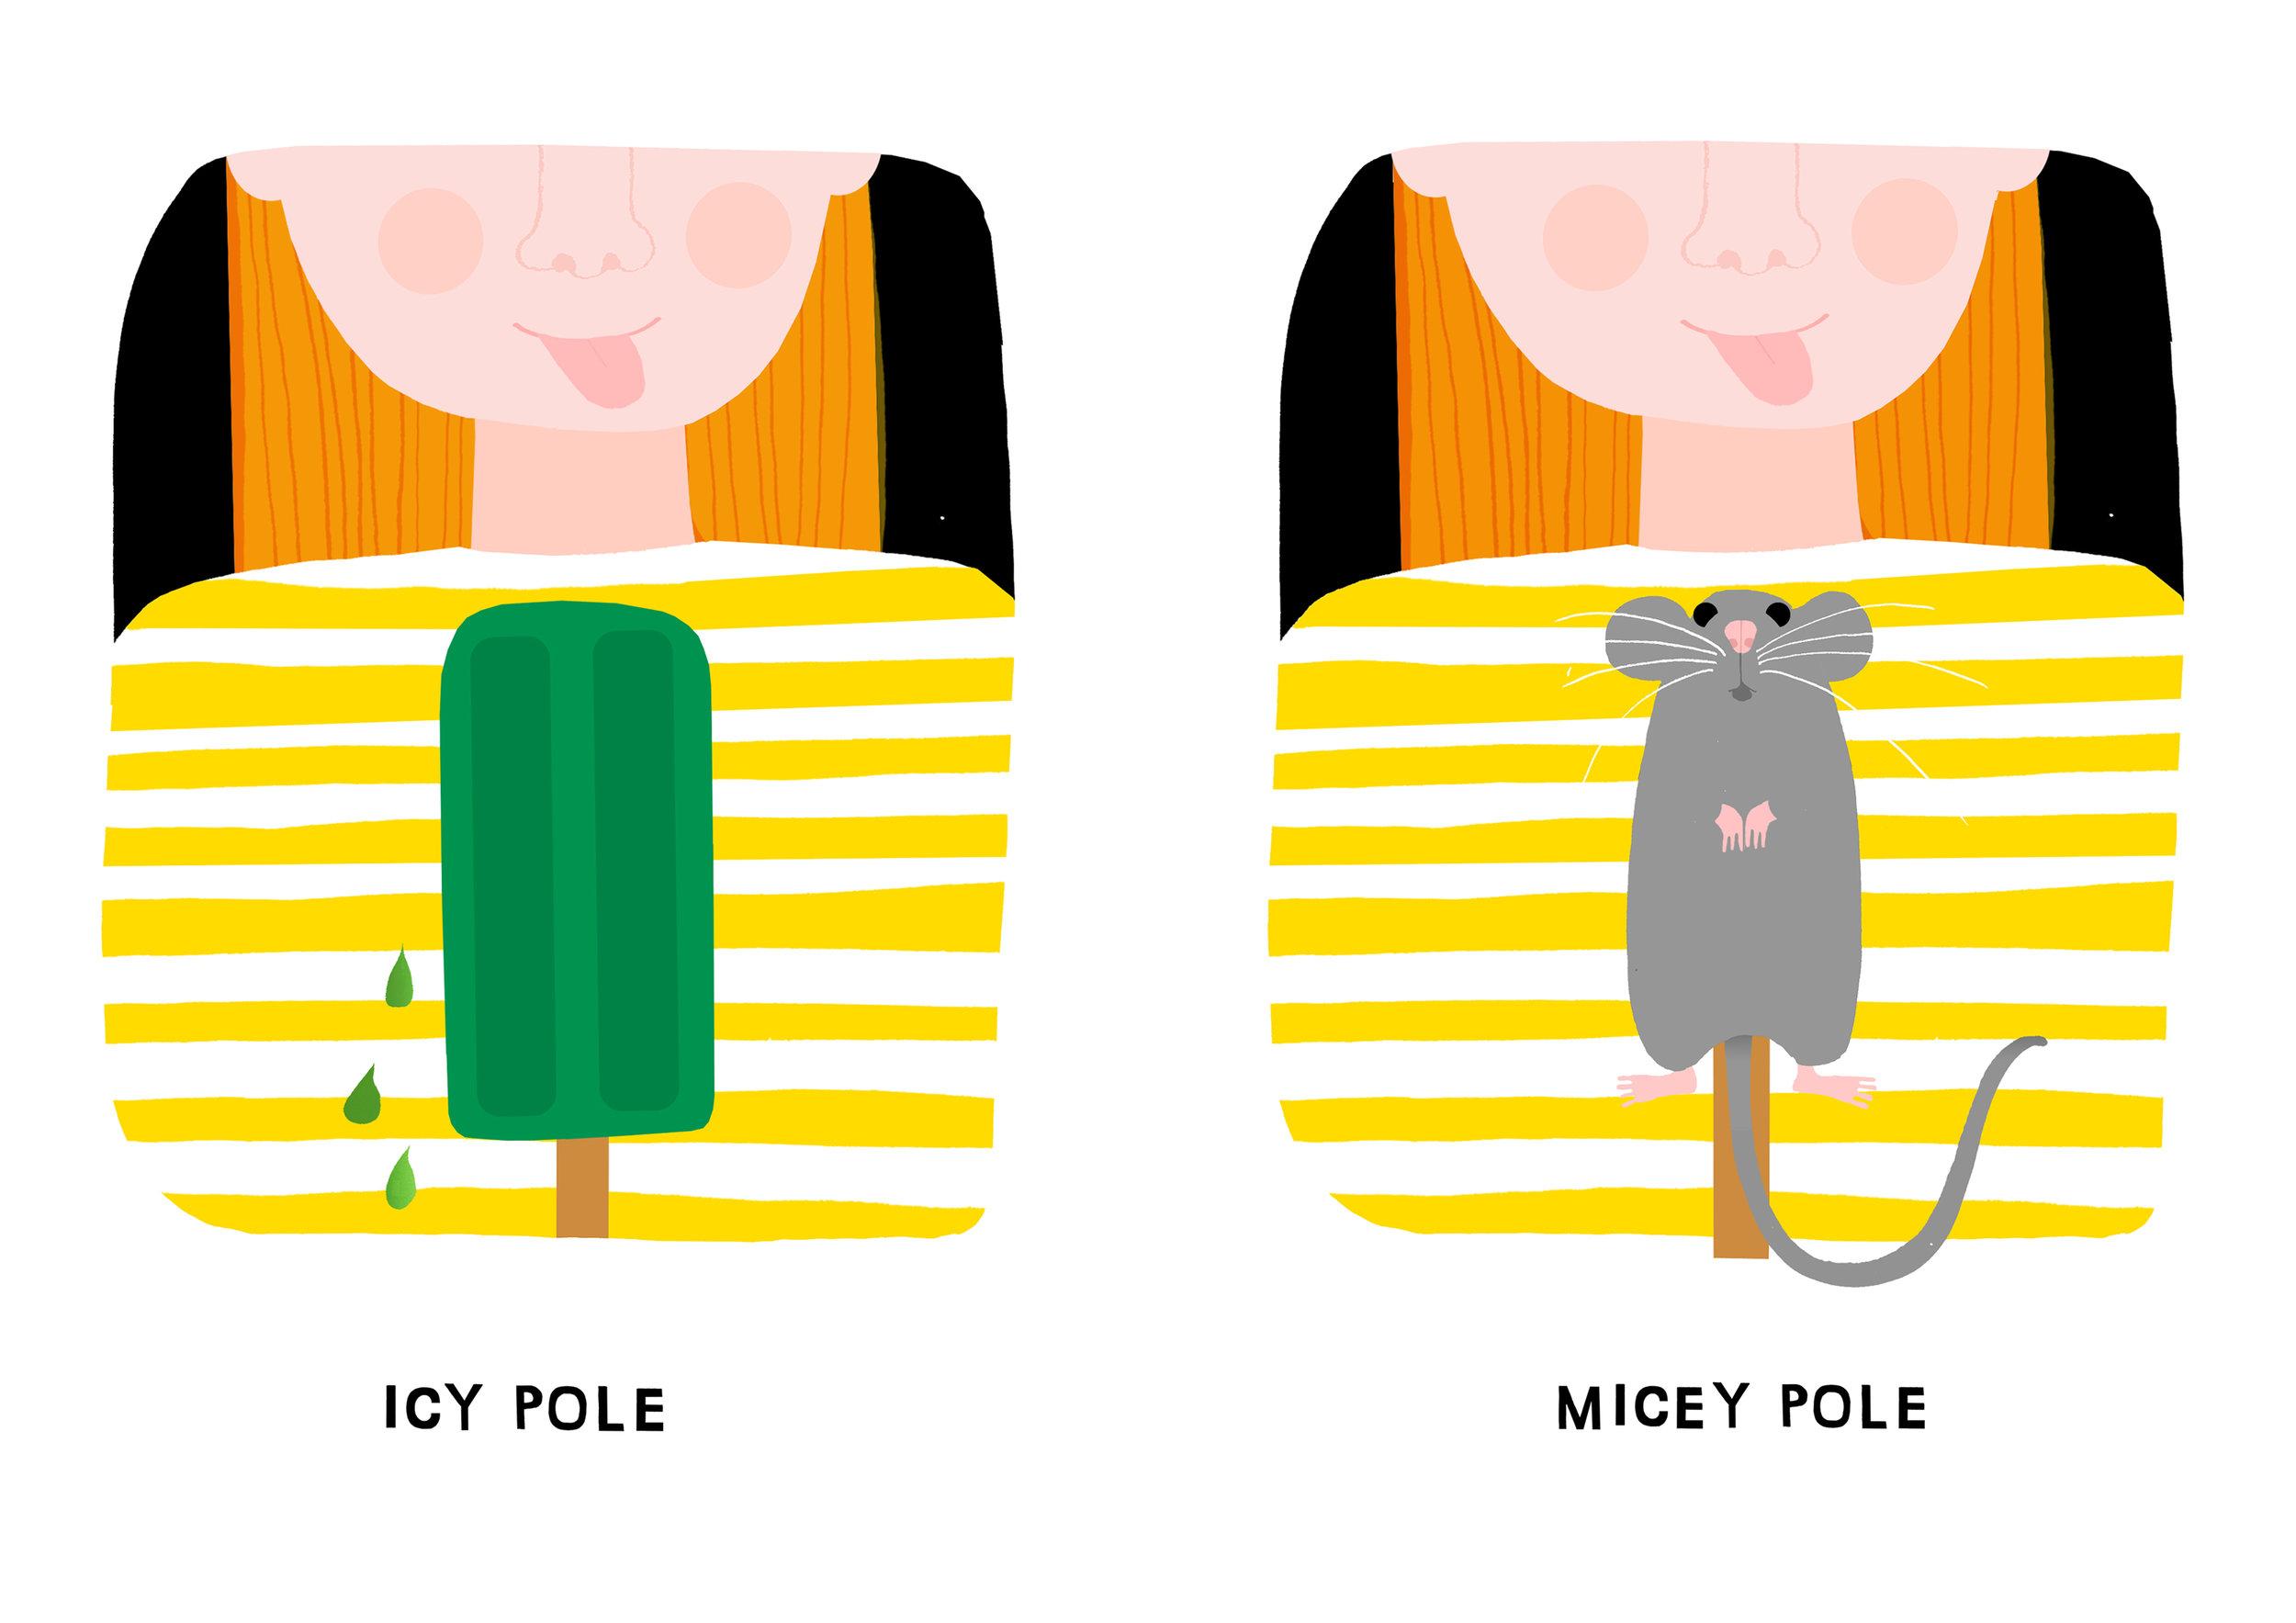 micey pole.jpg